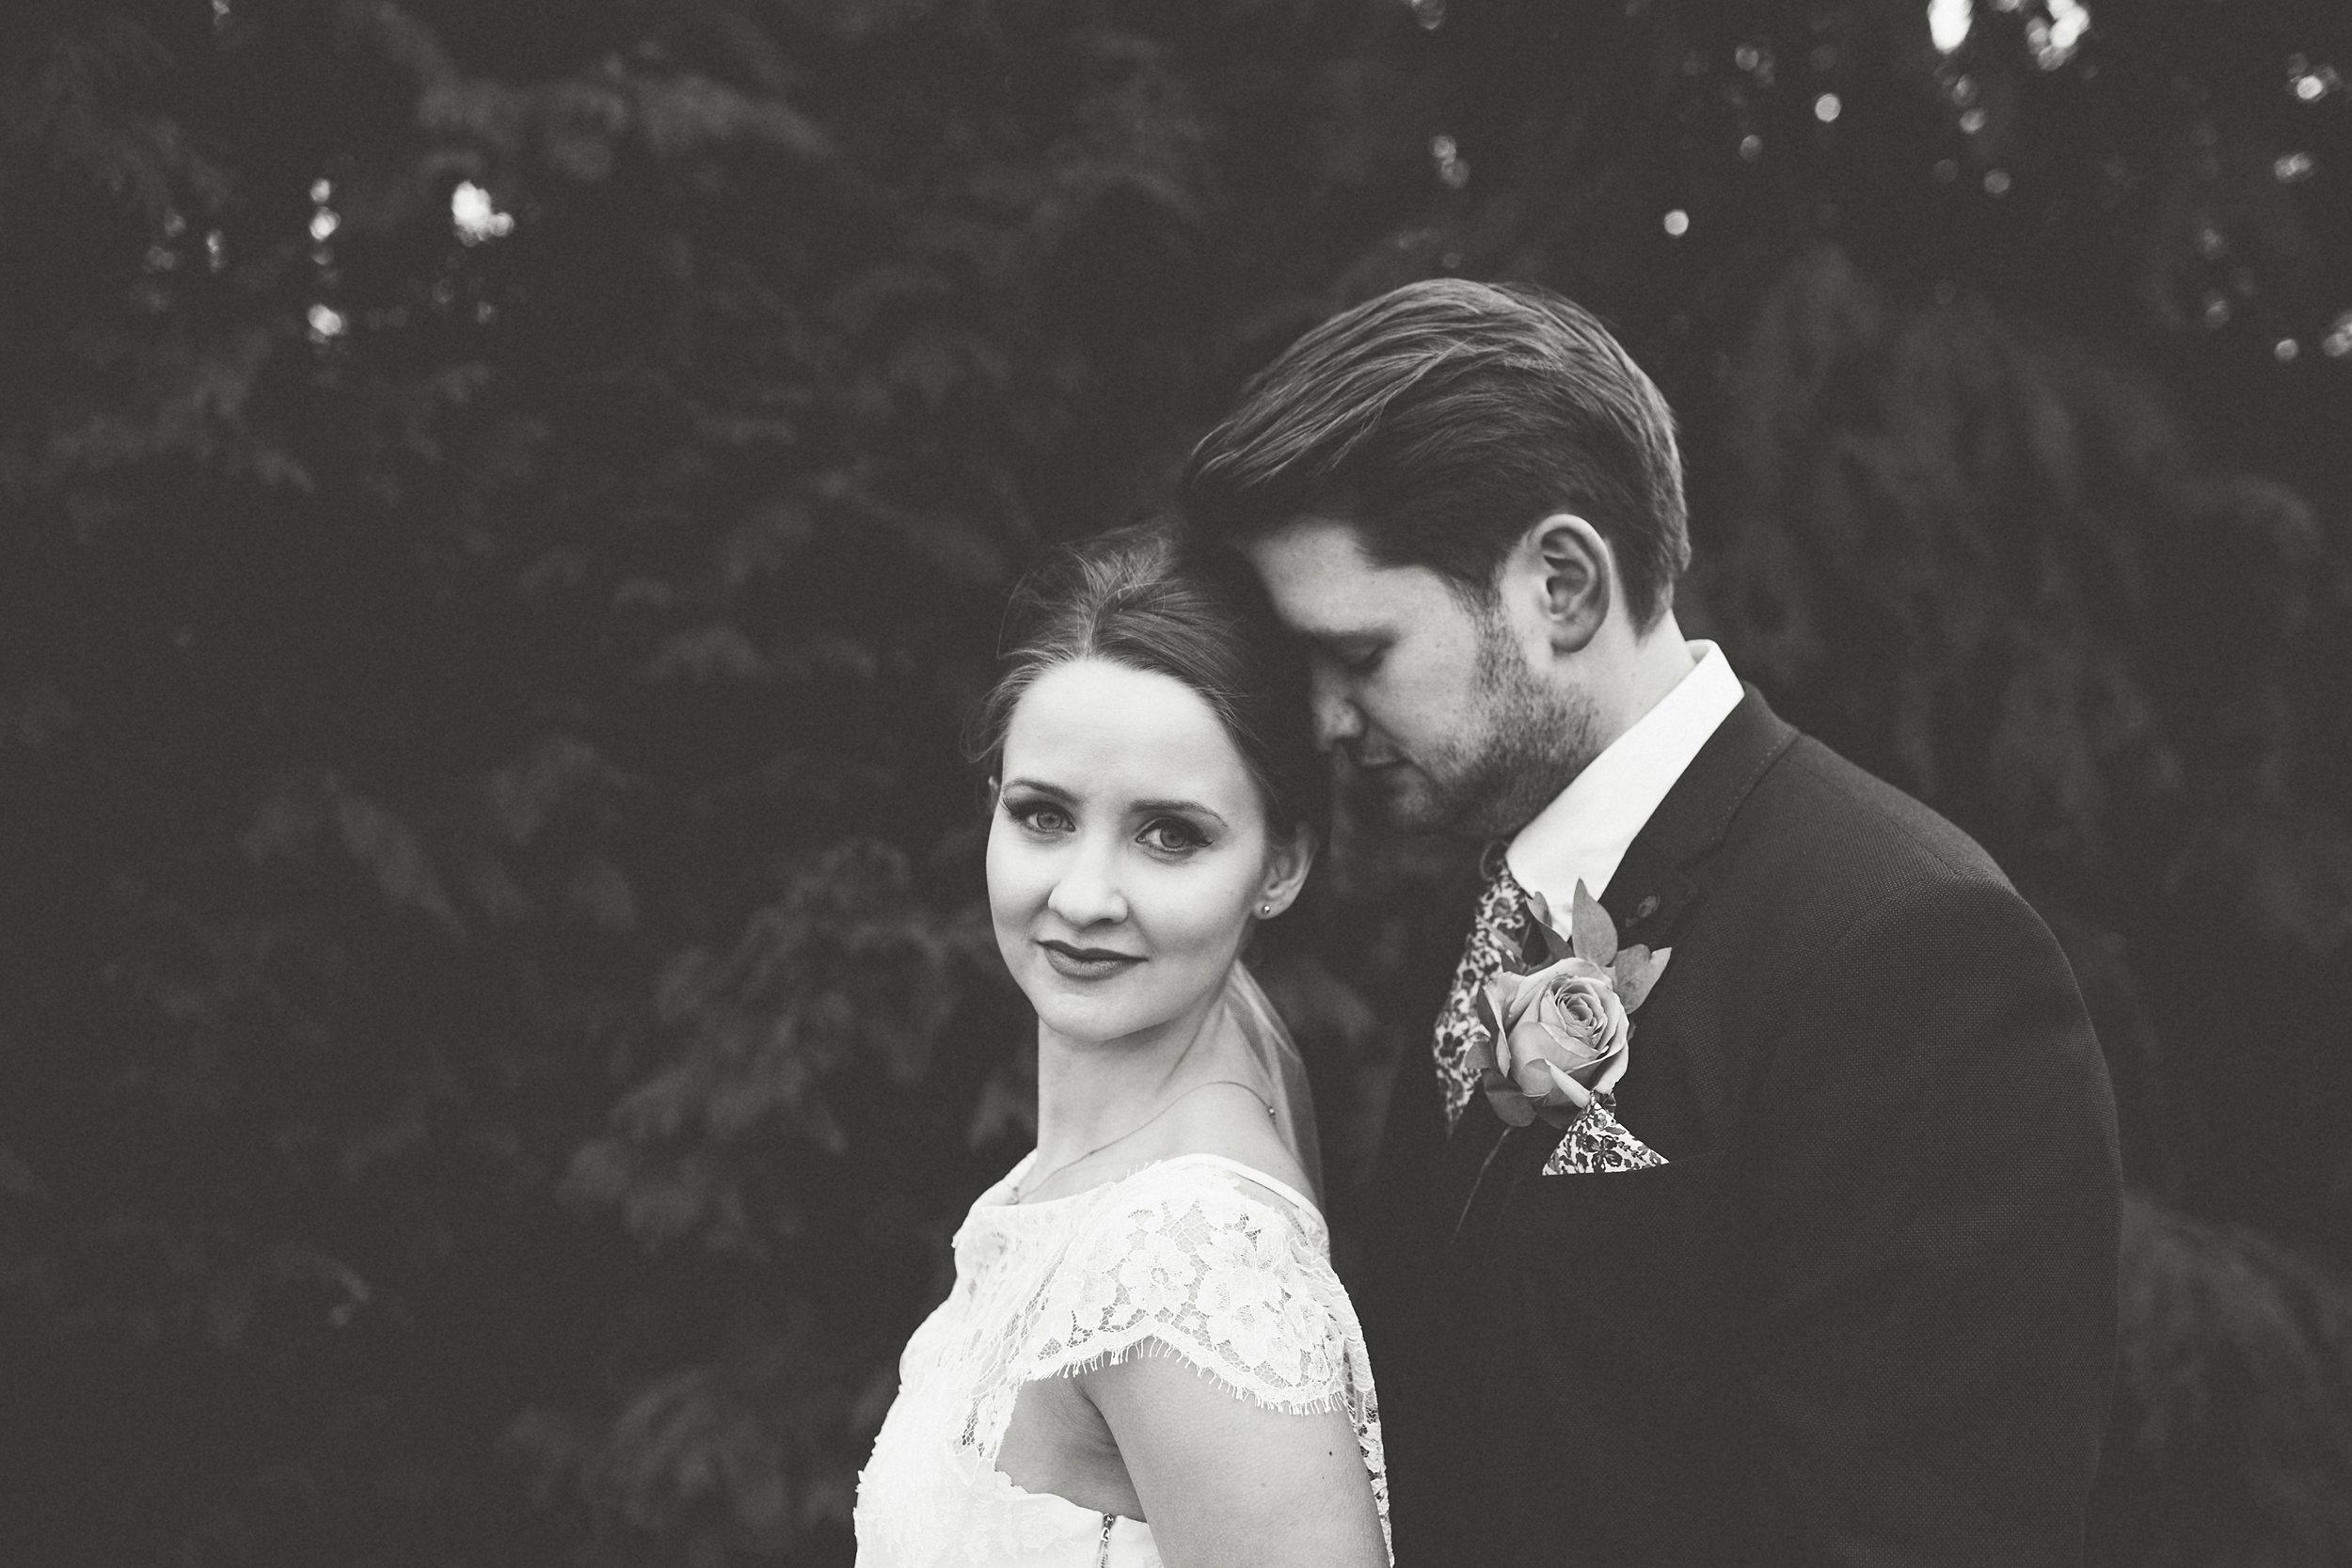 Samantha-Yorkshire-Sheffield-Bespoke-Vintage-Lace-Tulle-Bride-Wedding-Dress-Susanna-Greening-Derbyshire-7